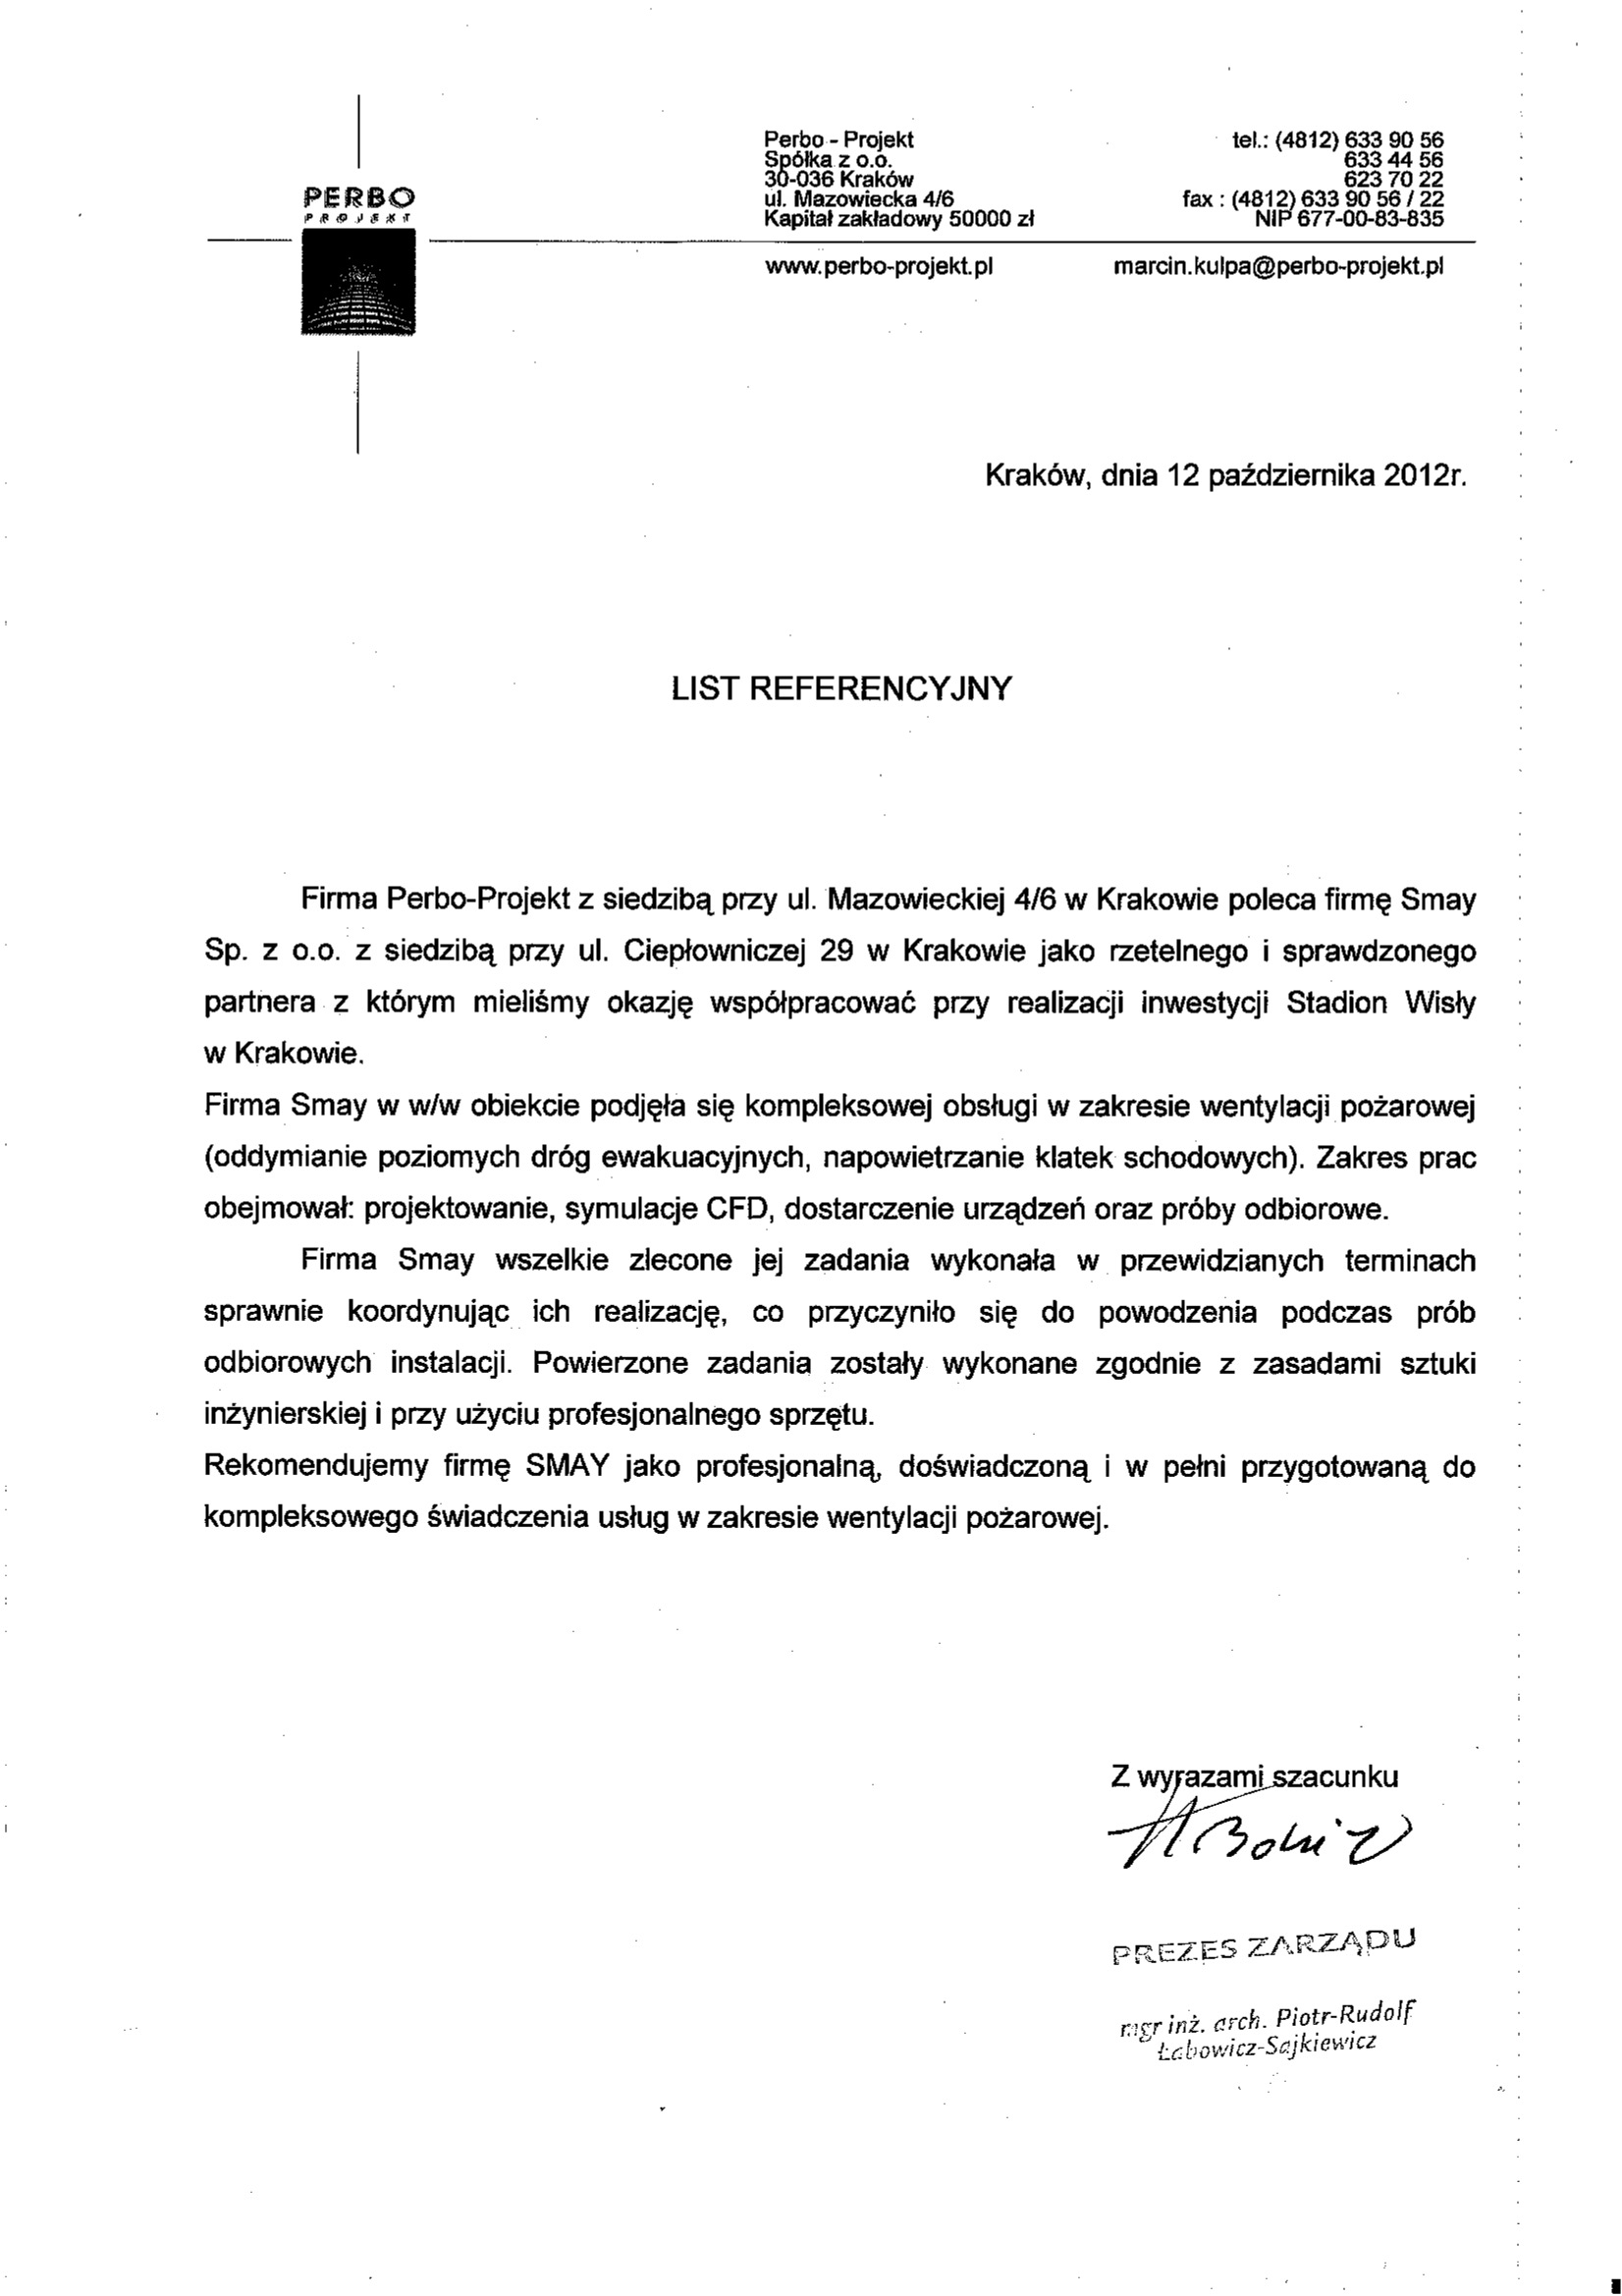 Reference - Perbo-Projekt